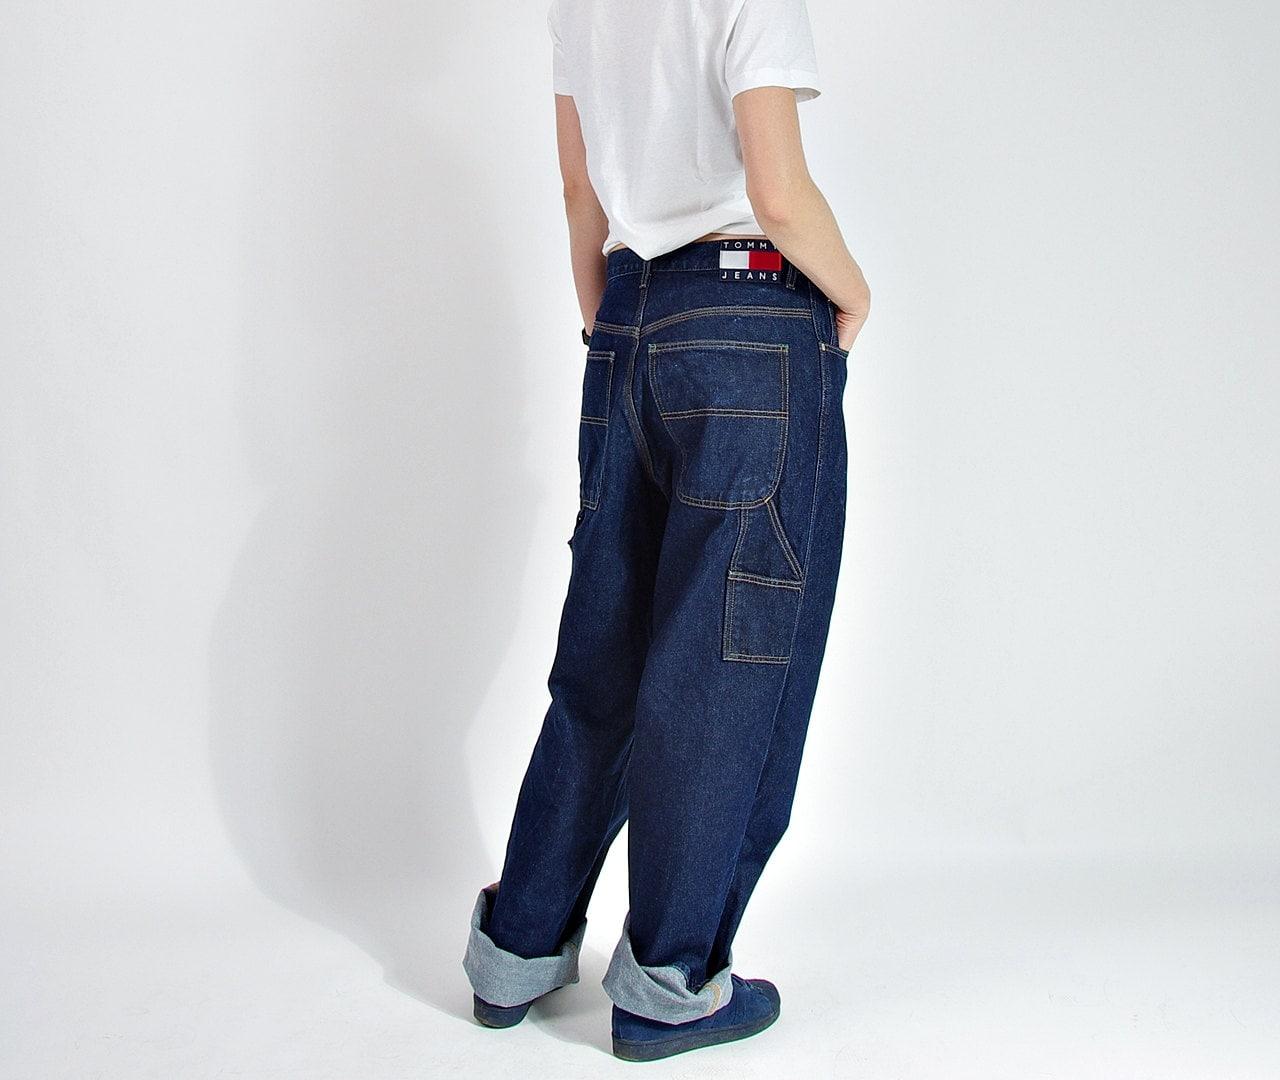 90s Tommy Hilfiger Baggy Jeans / Hip Hop Rap Style American